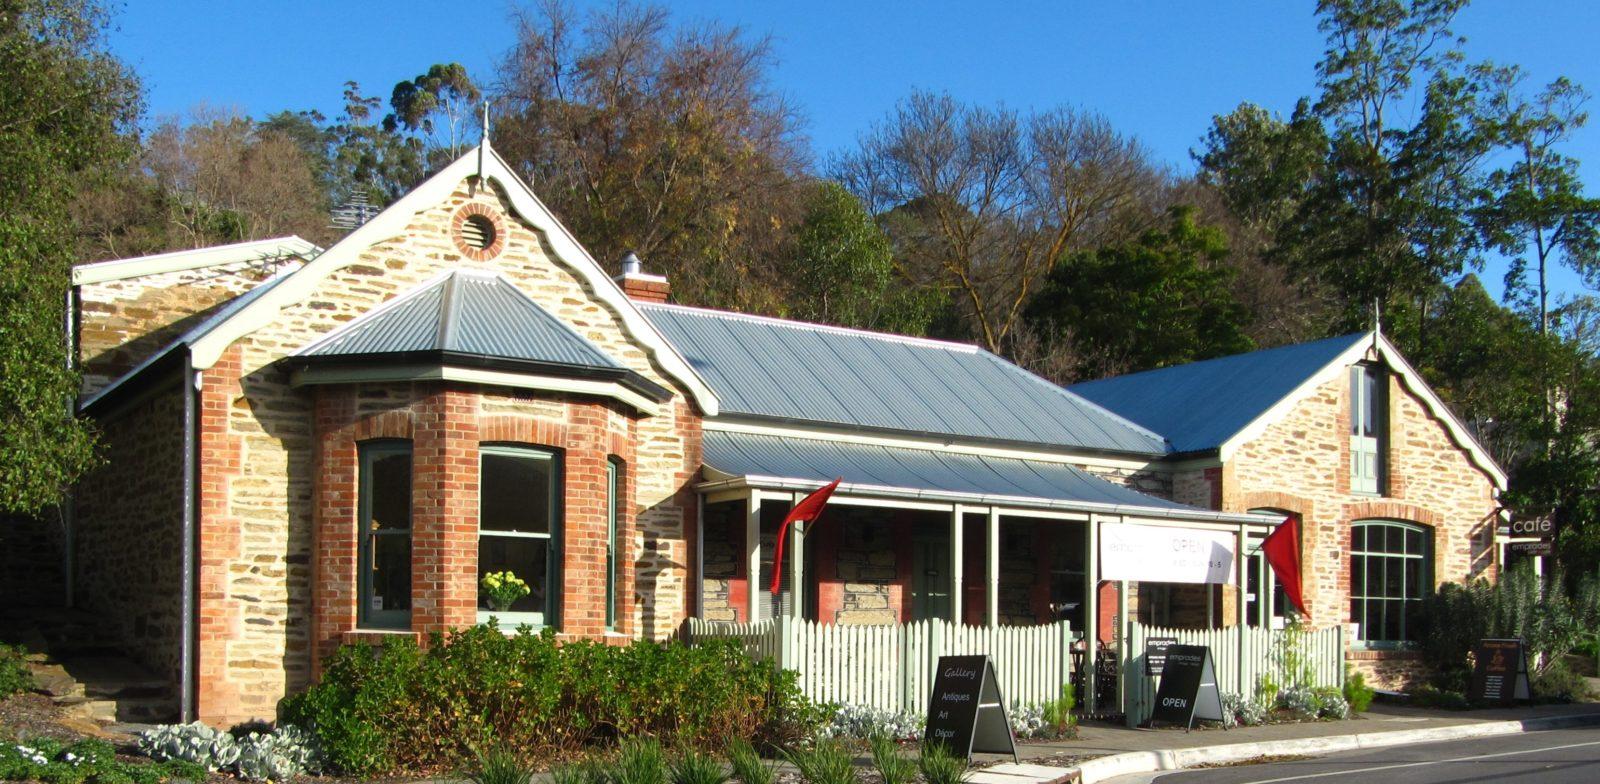 Clarendon South Australia Historic Building Shop Front Emprades vintage + design